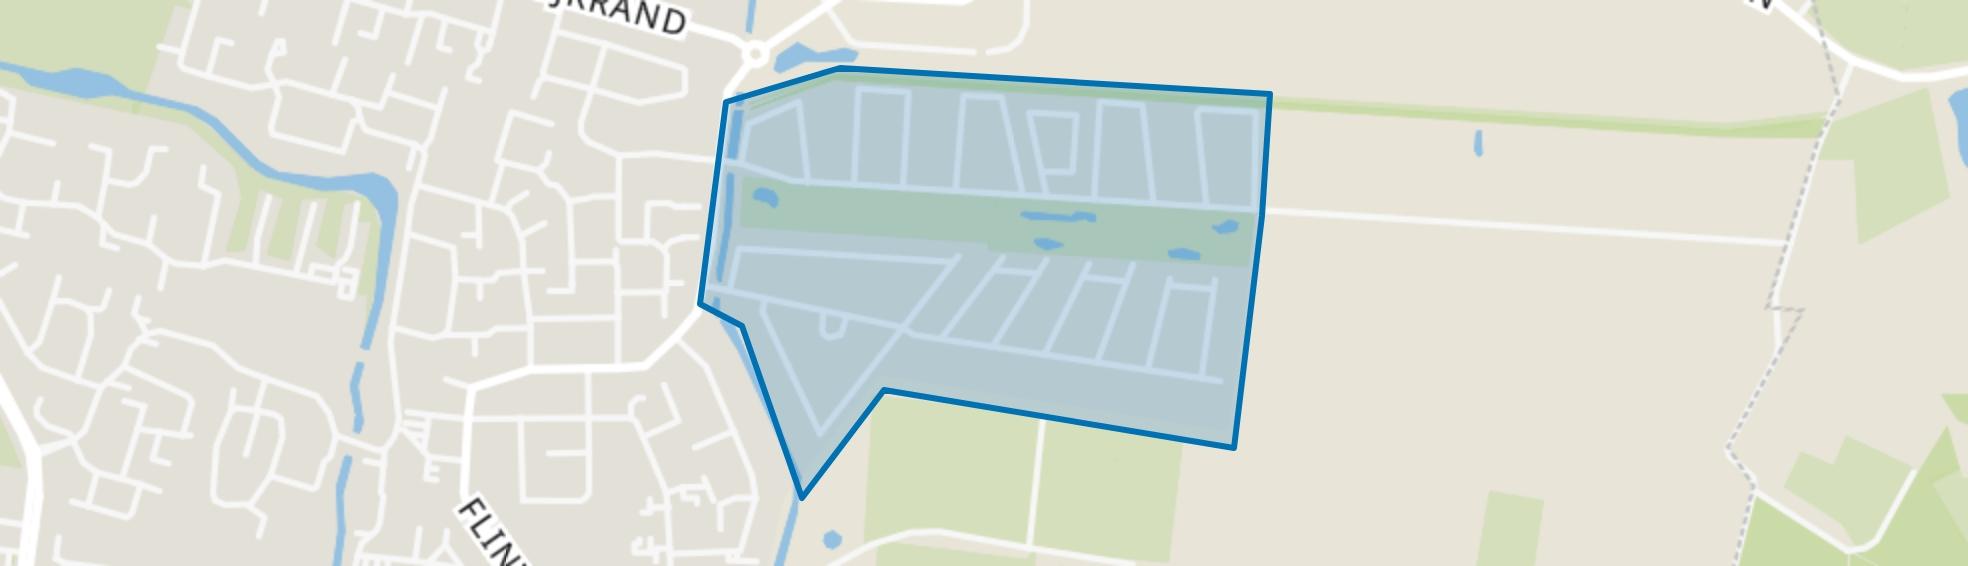 Landerije, Roosendaal map